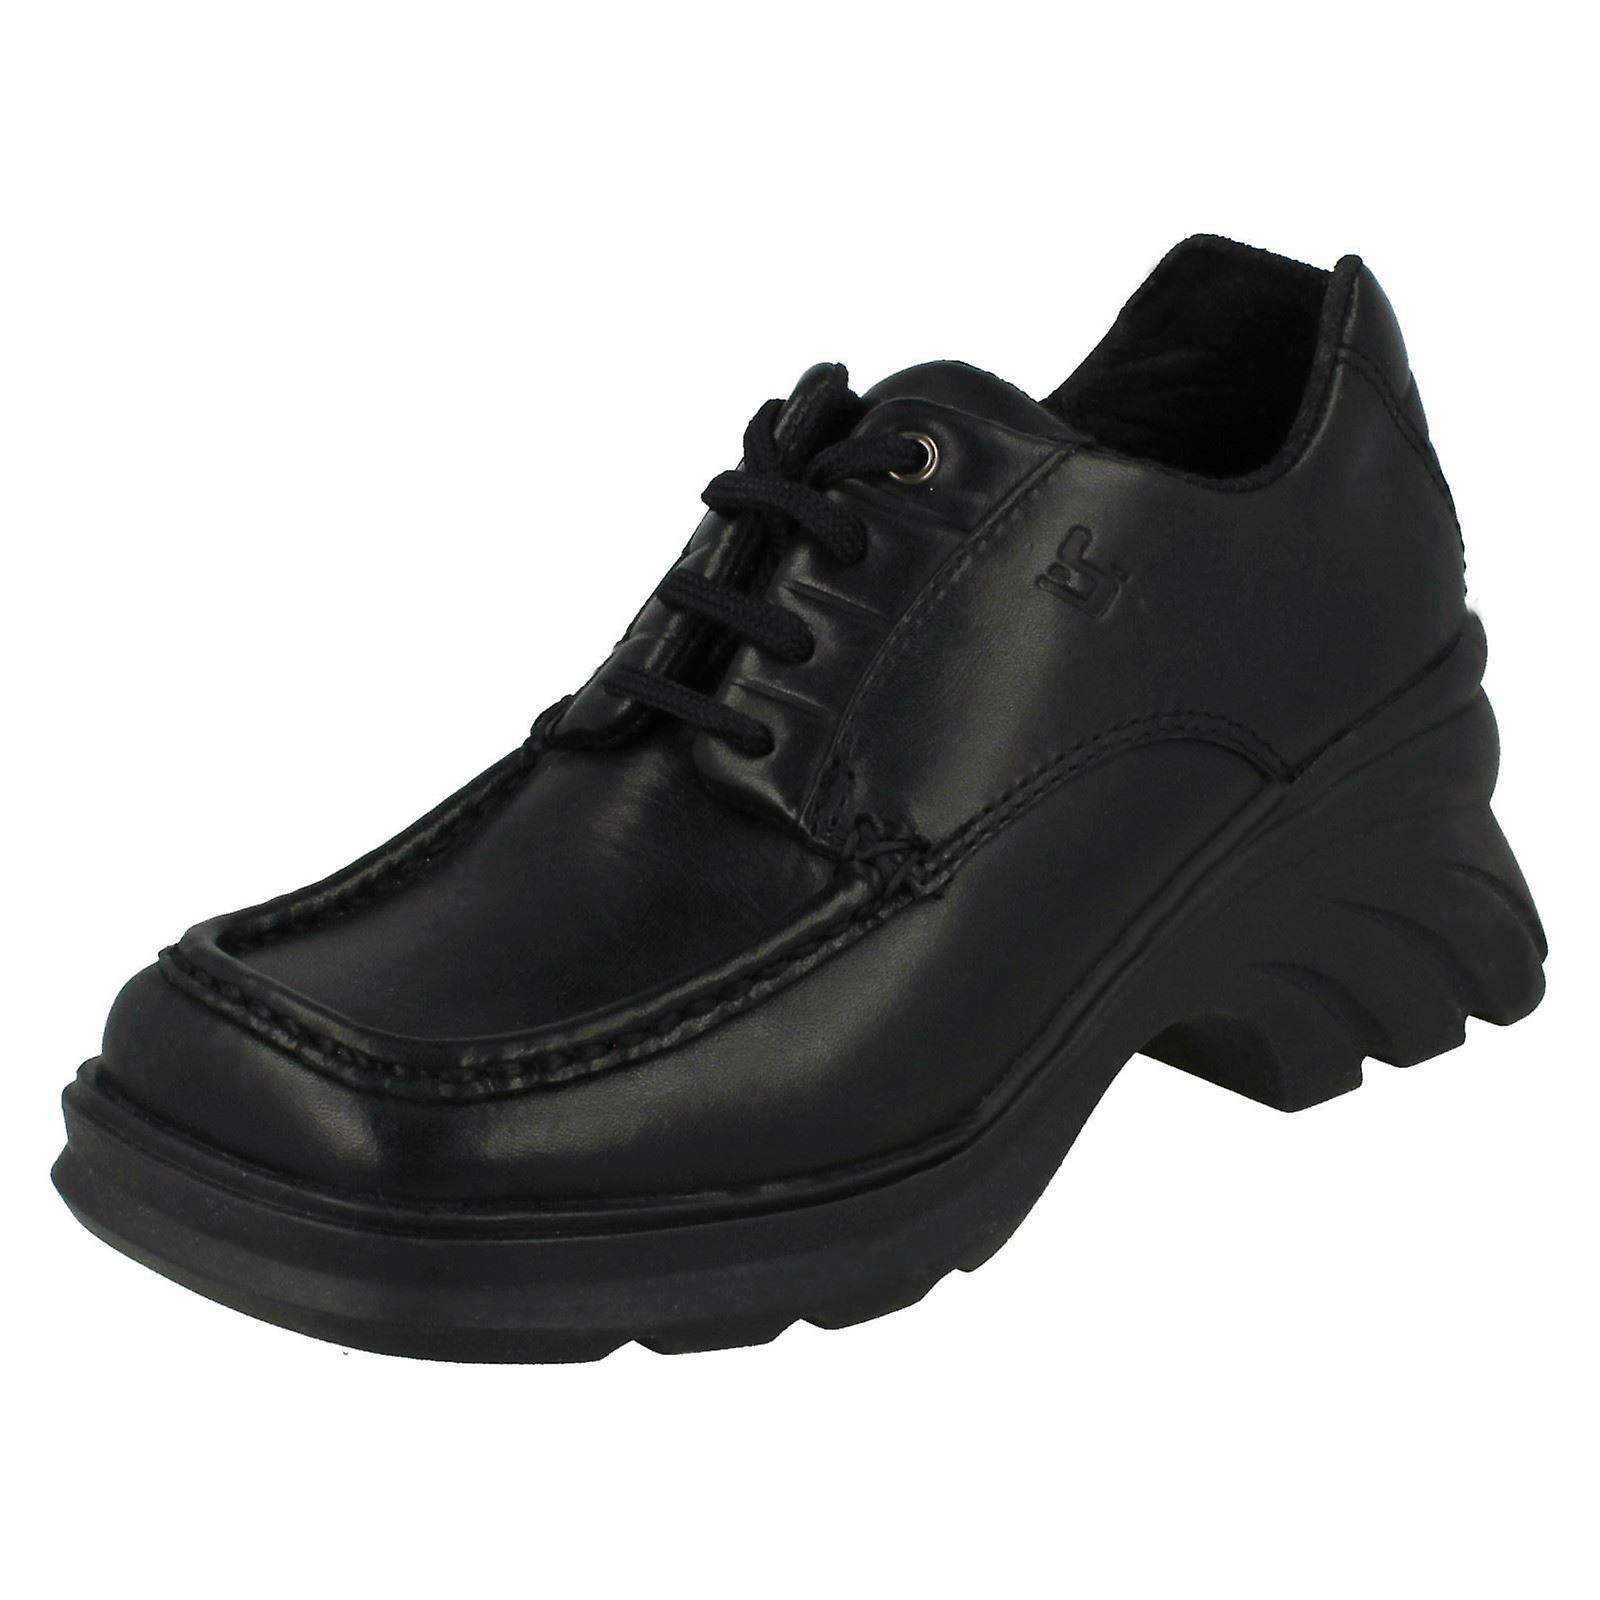 e6a7a67b9be7 Girls Bootleg Biker Chick Heeled Formal School Shoes Shoes Shoes 173b3a